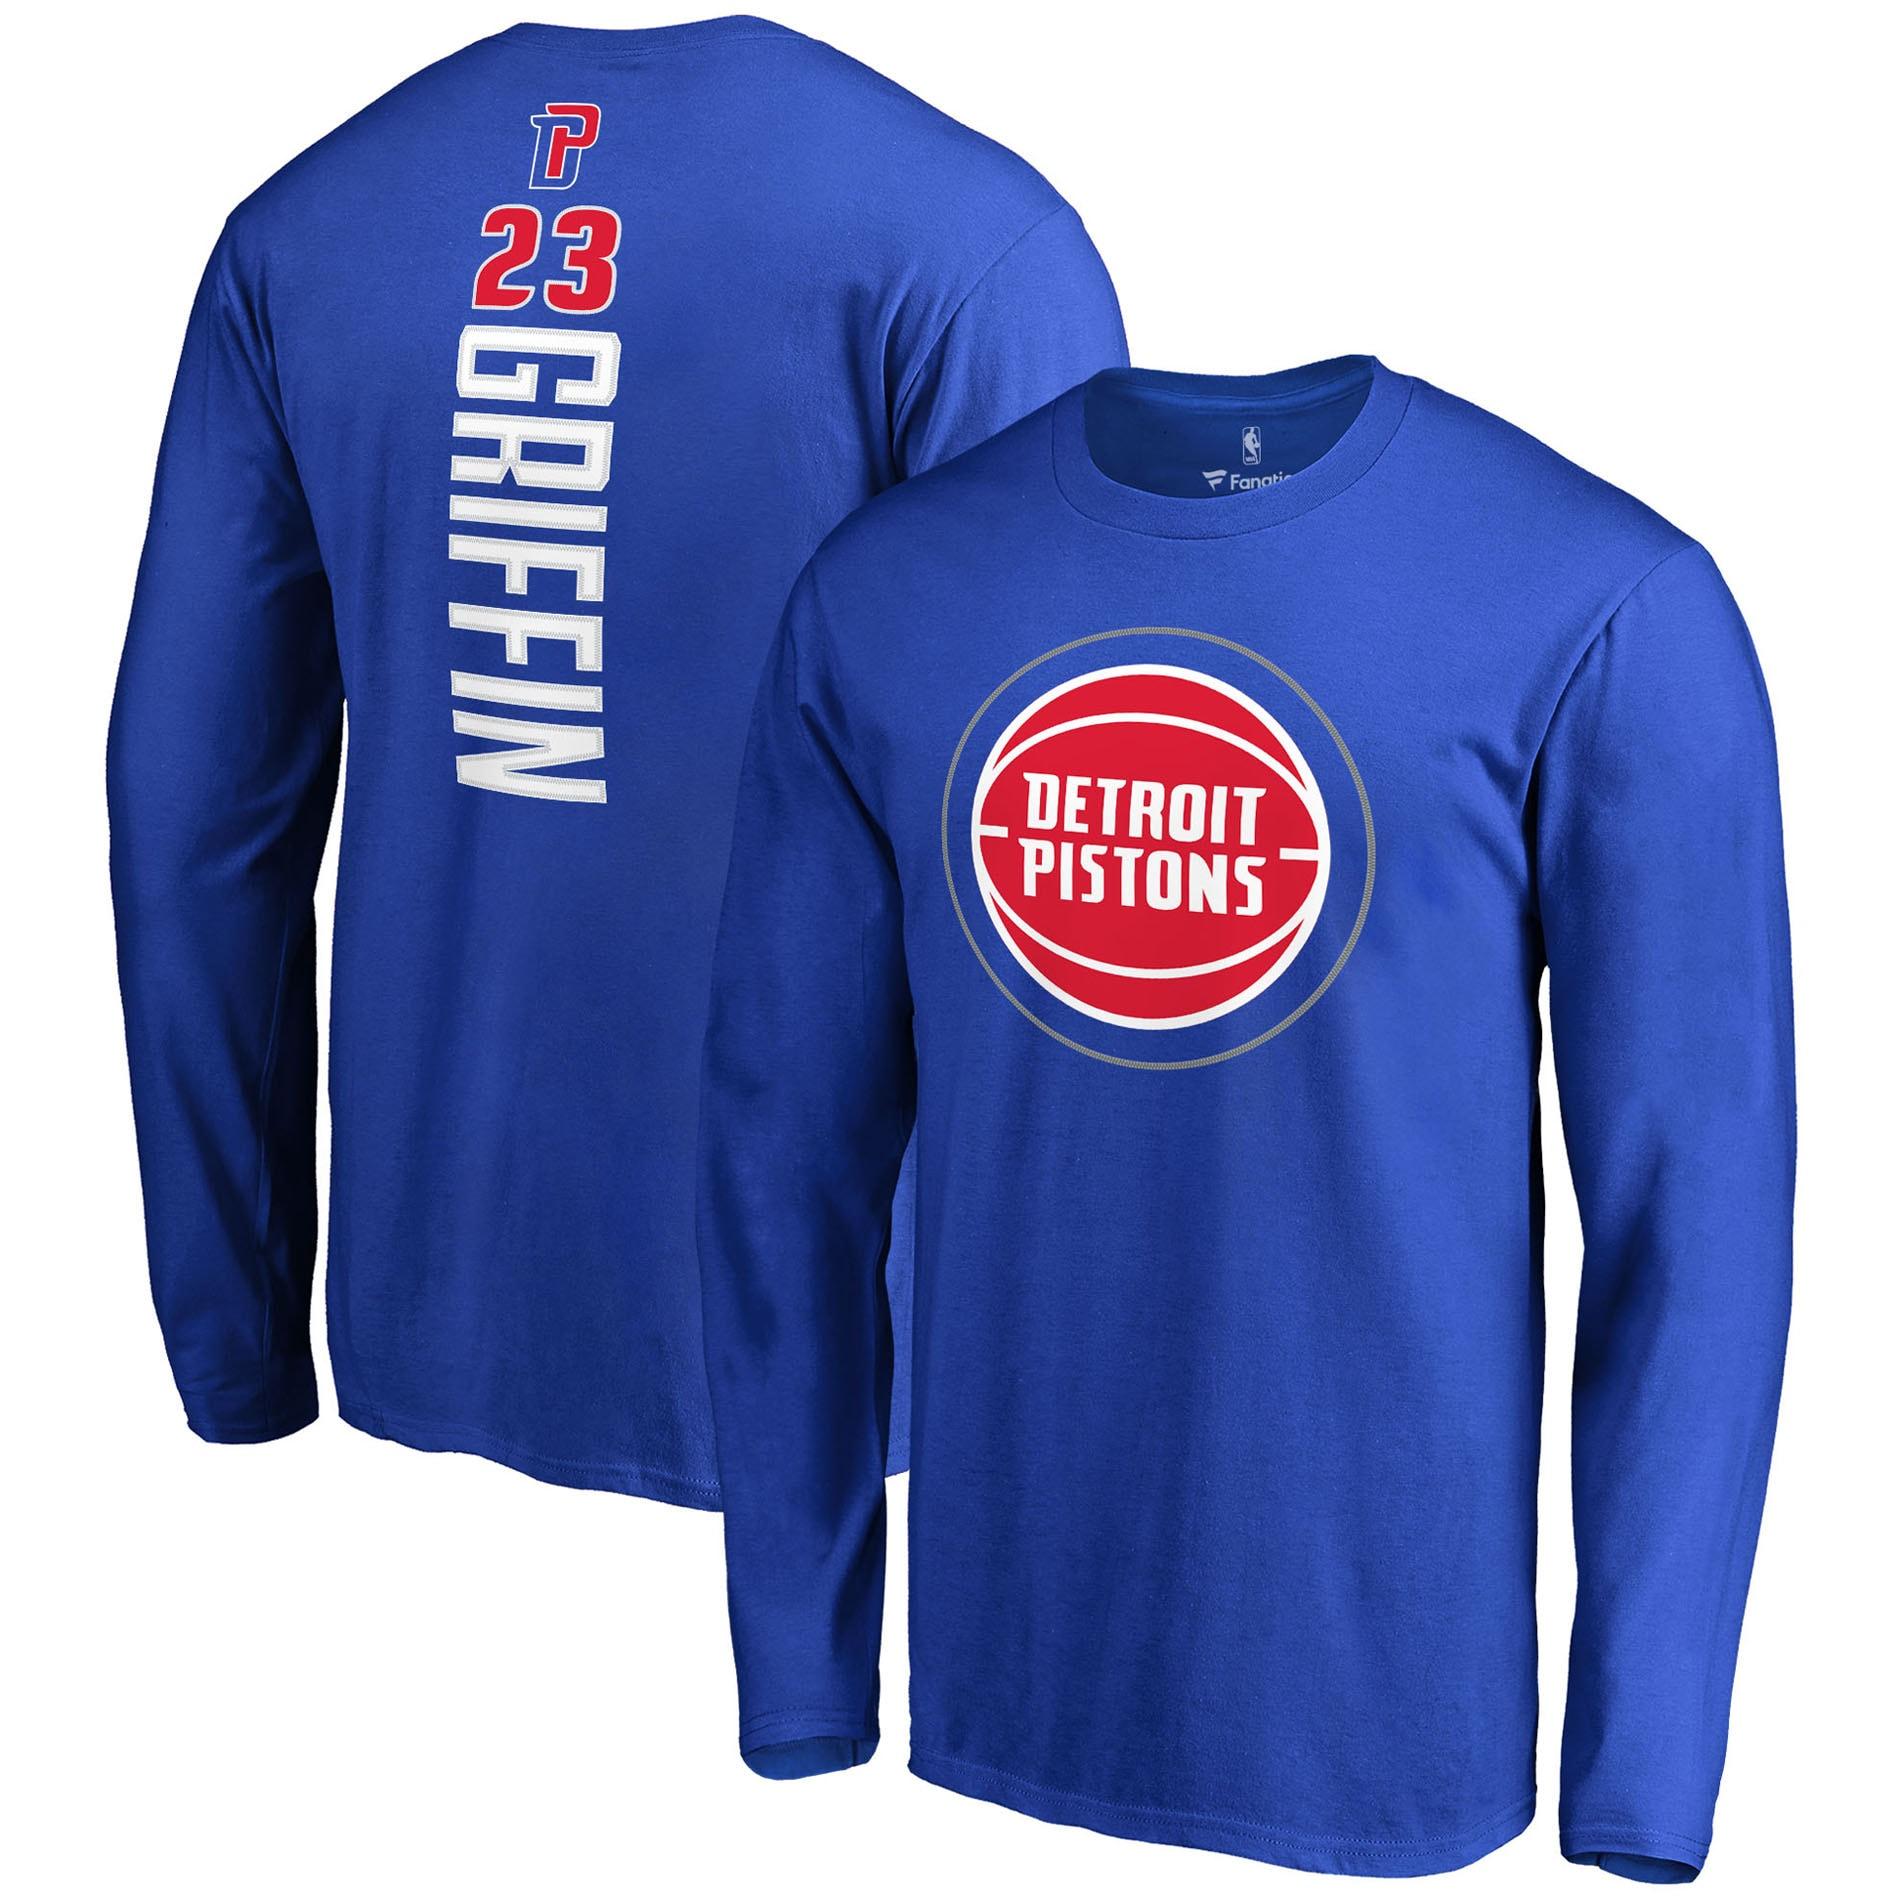 Blake Griffin Detroit Pistons Fanatics Branded Backer Long Sleeve T-Shirt - Blue